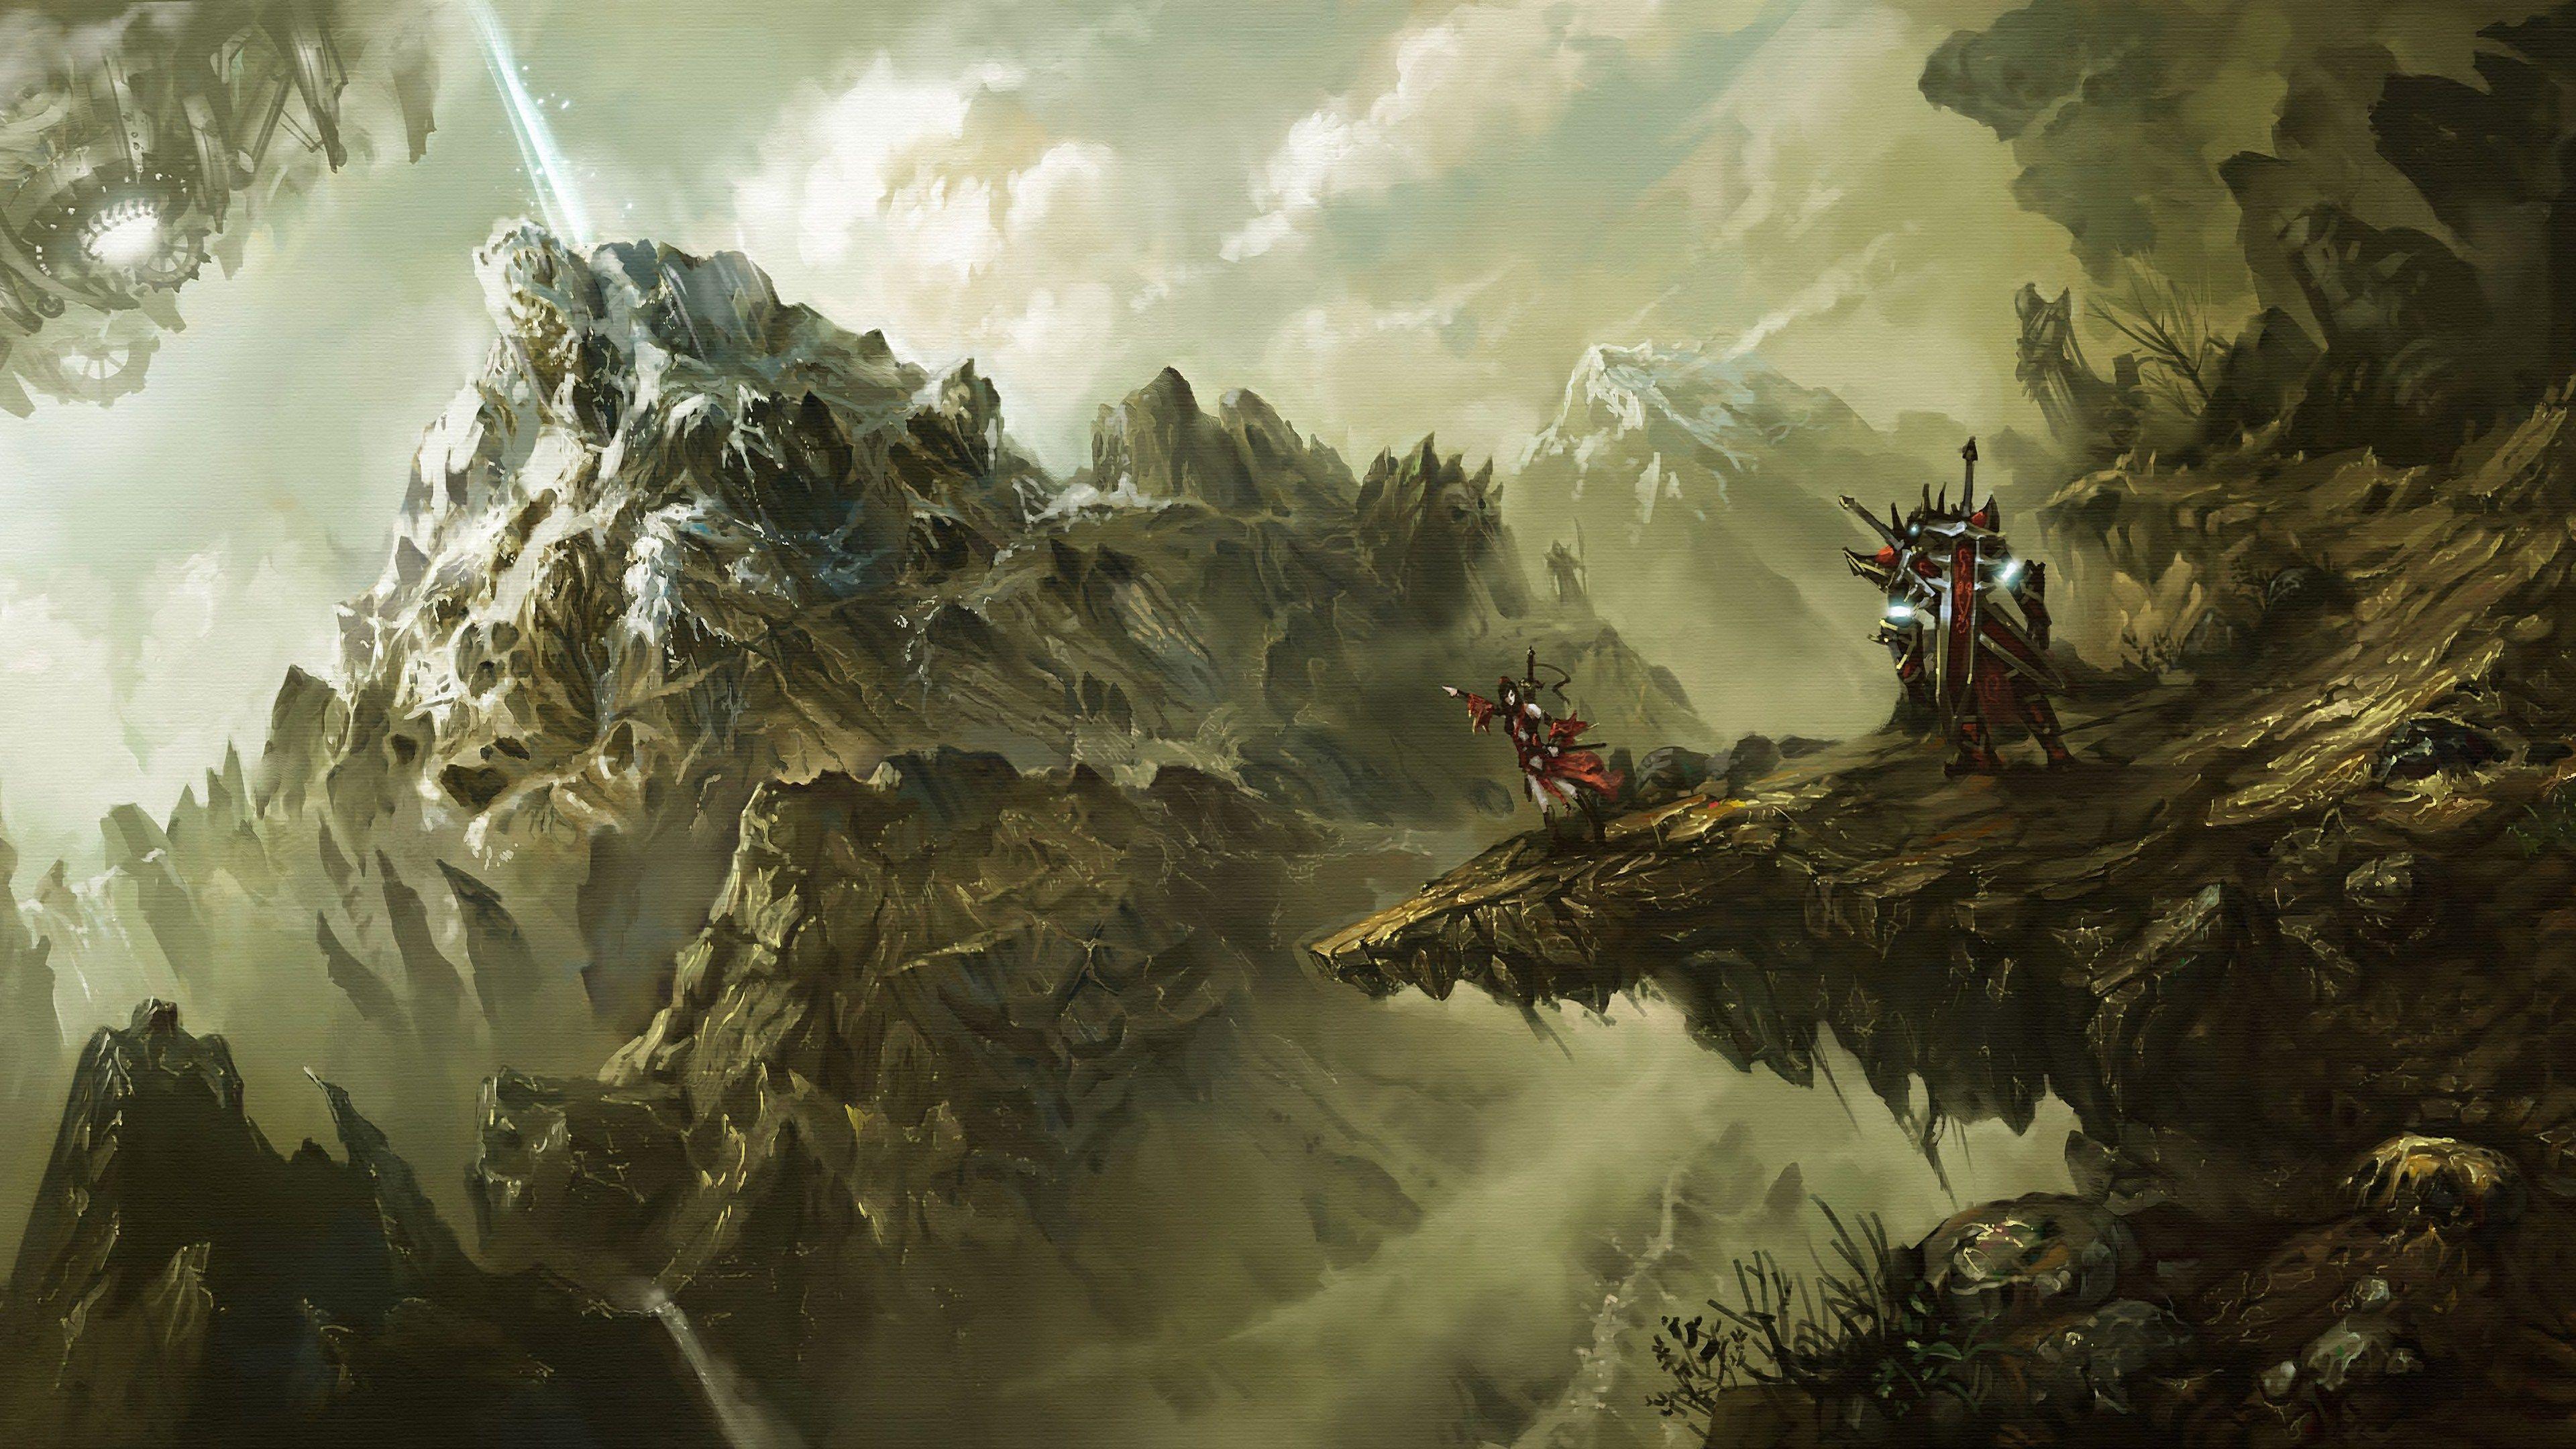 Mountains_Warrior Computer Wallpapers, Desktop Backgrounds